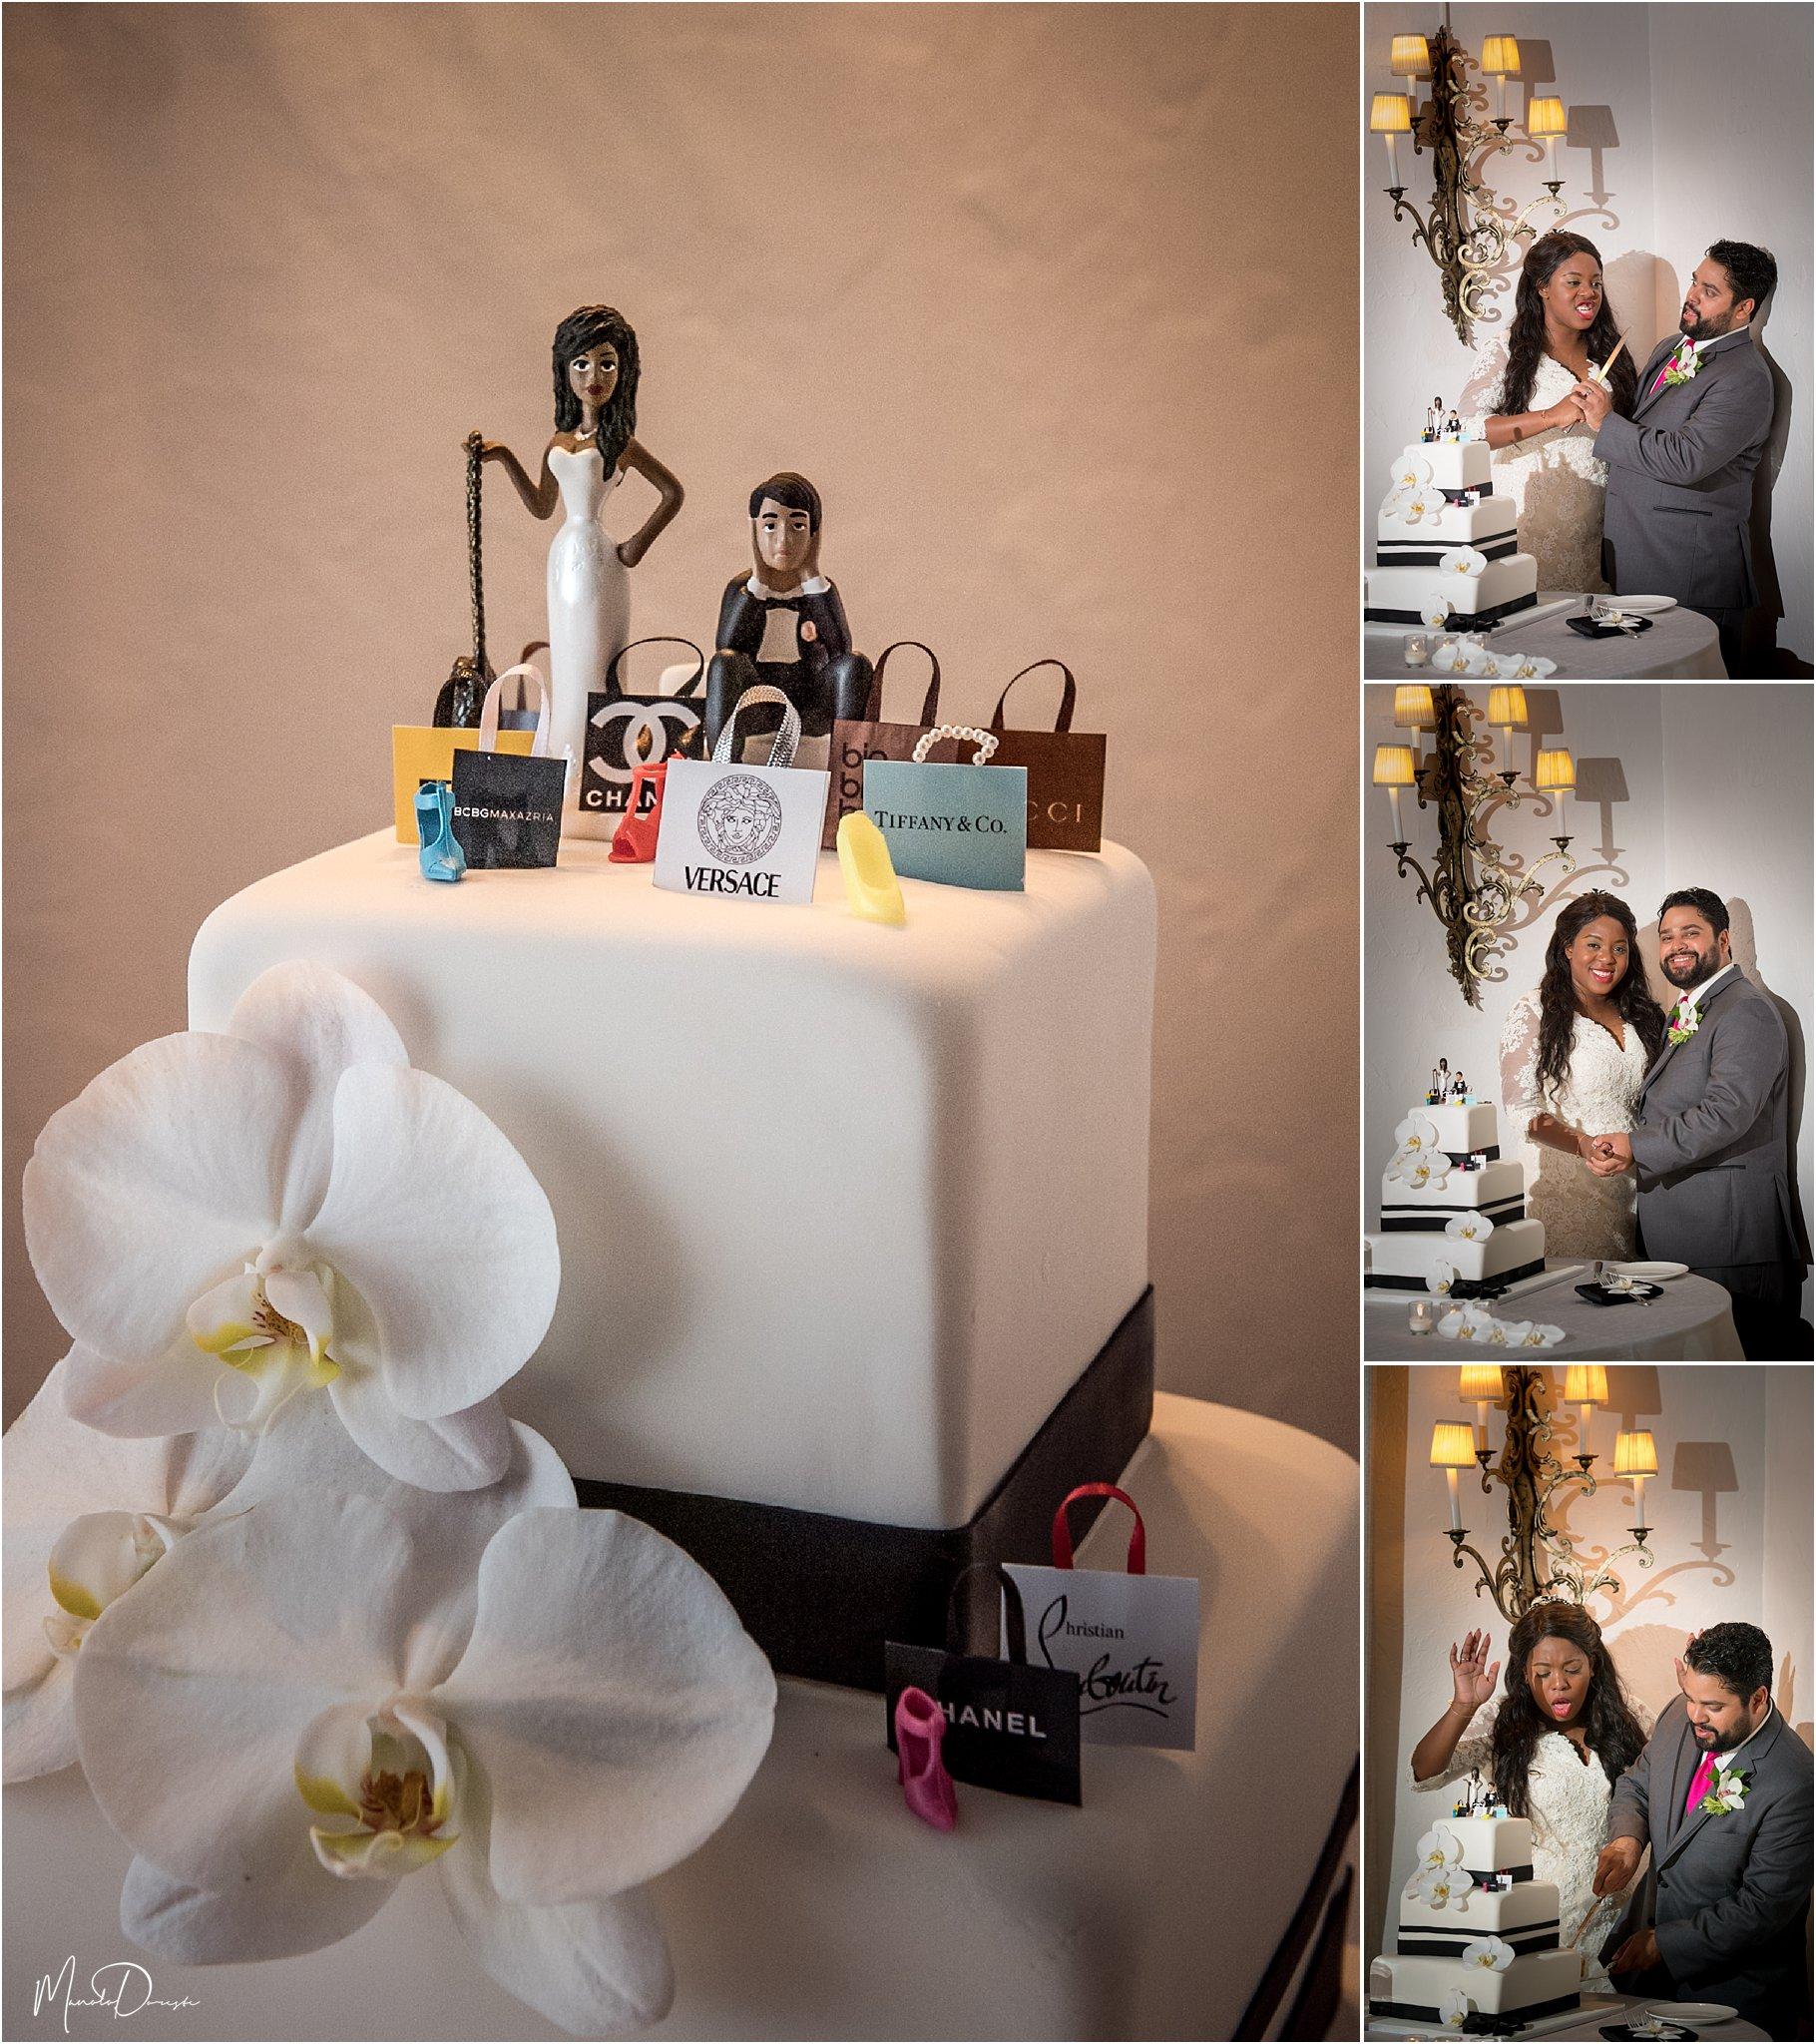 0432_ManoloDoreste_InFocusStudios_Wedding_Family_Photography_Miami_MiamiPhotographer.jpg